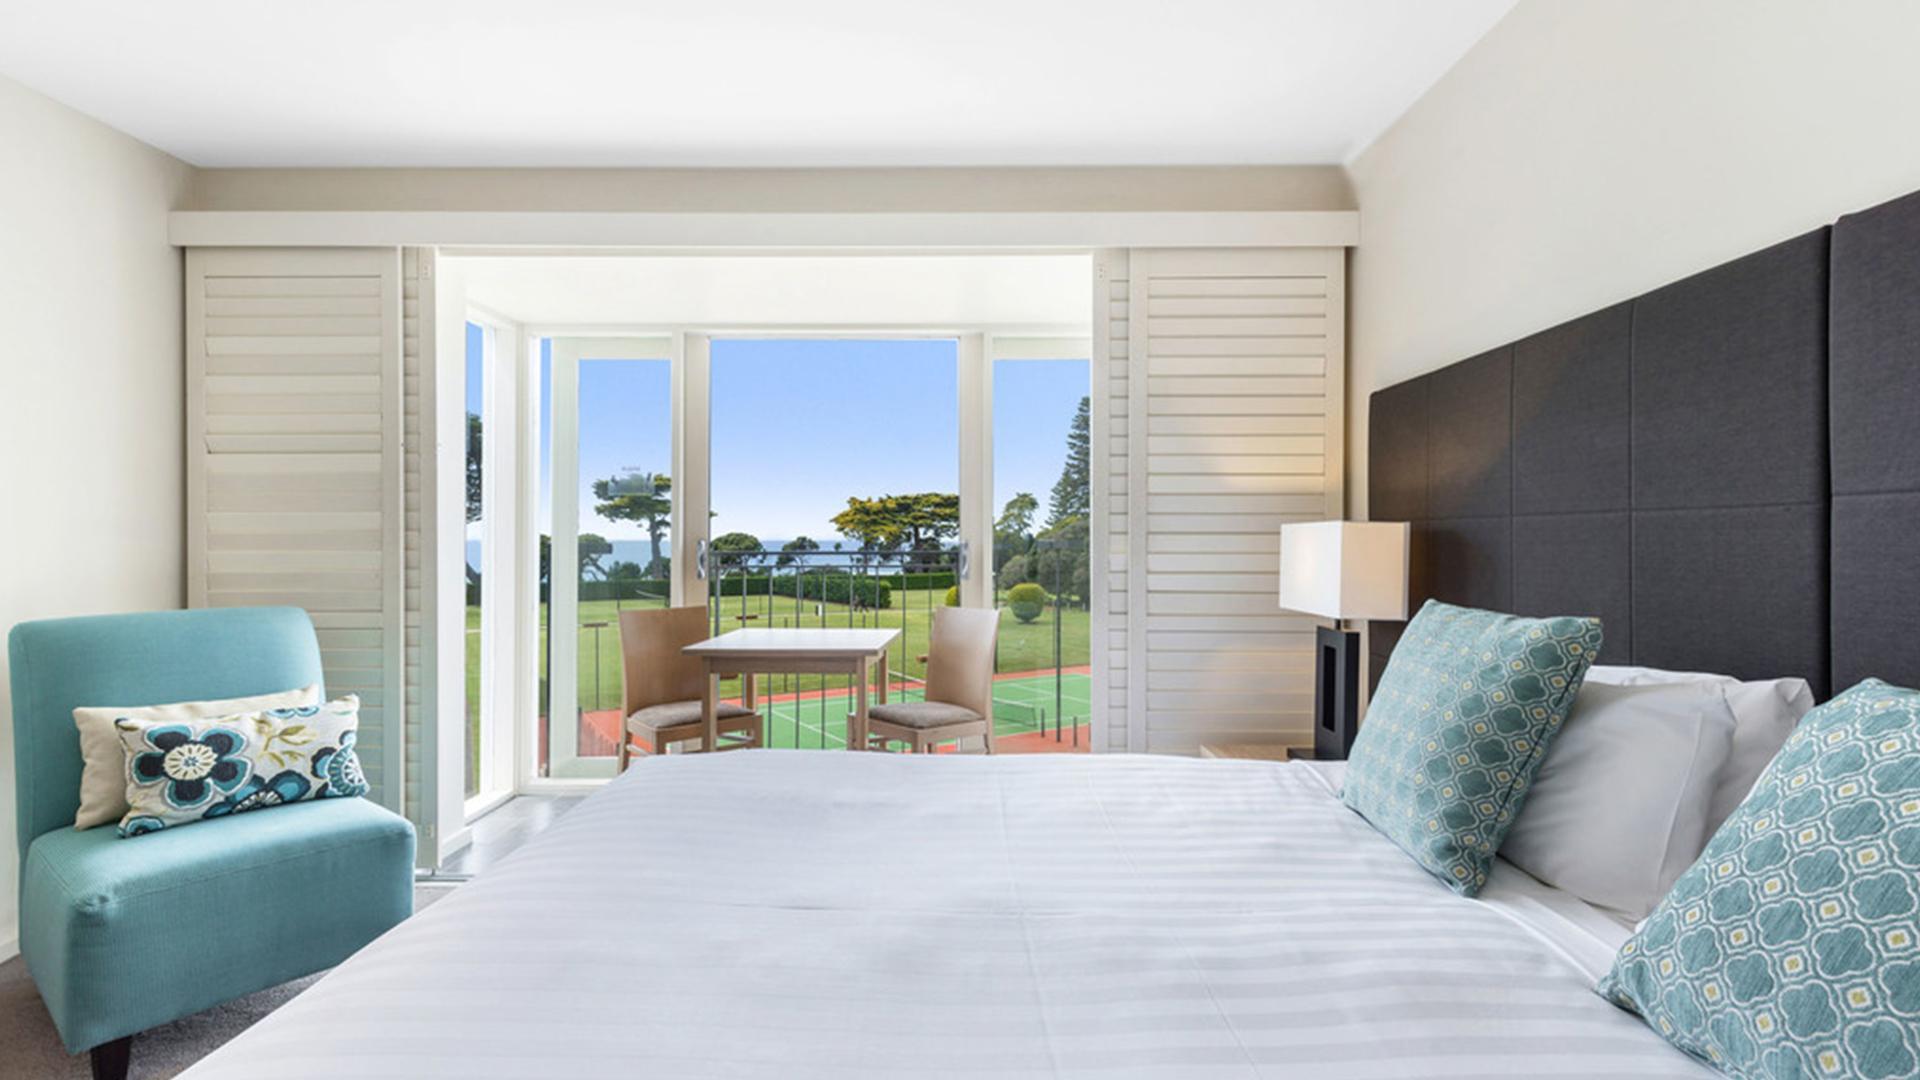 Resort Room image 1 at Mantra Lorne by Surf Coast Shire, Victoria, Australia